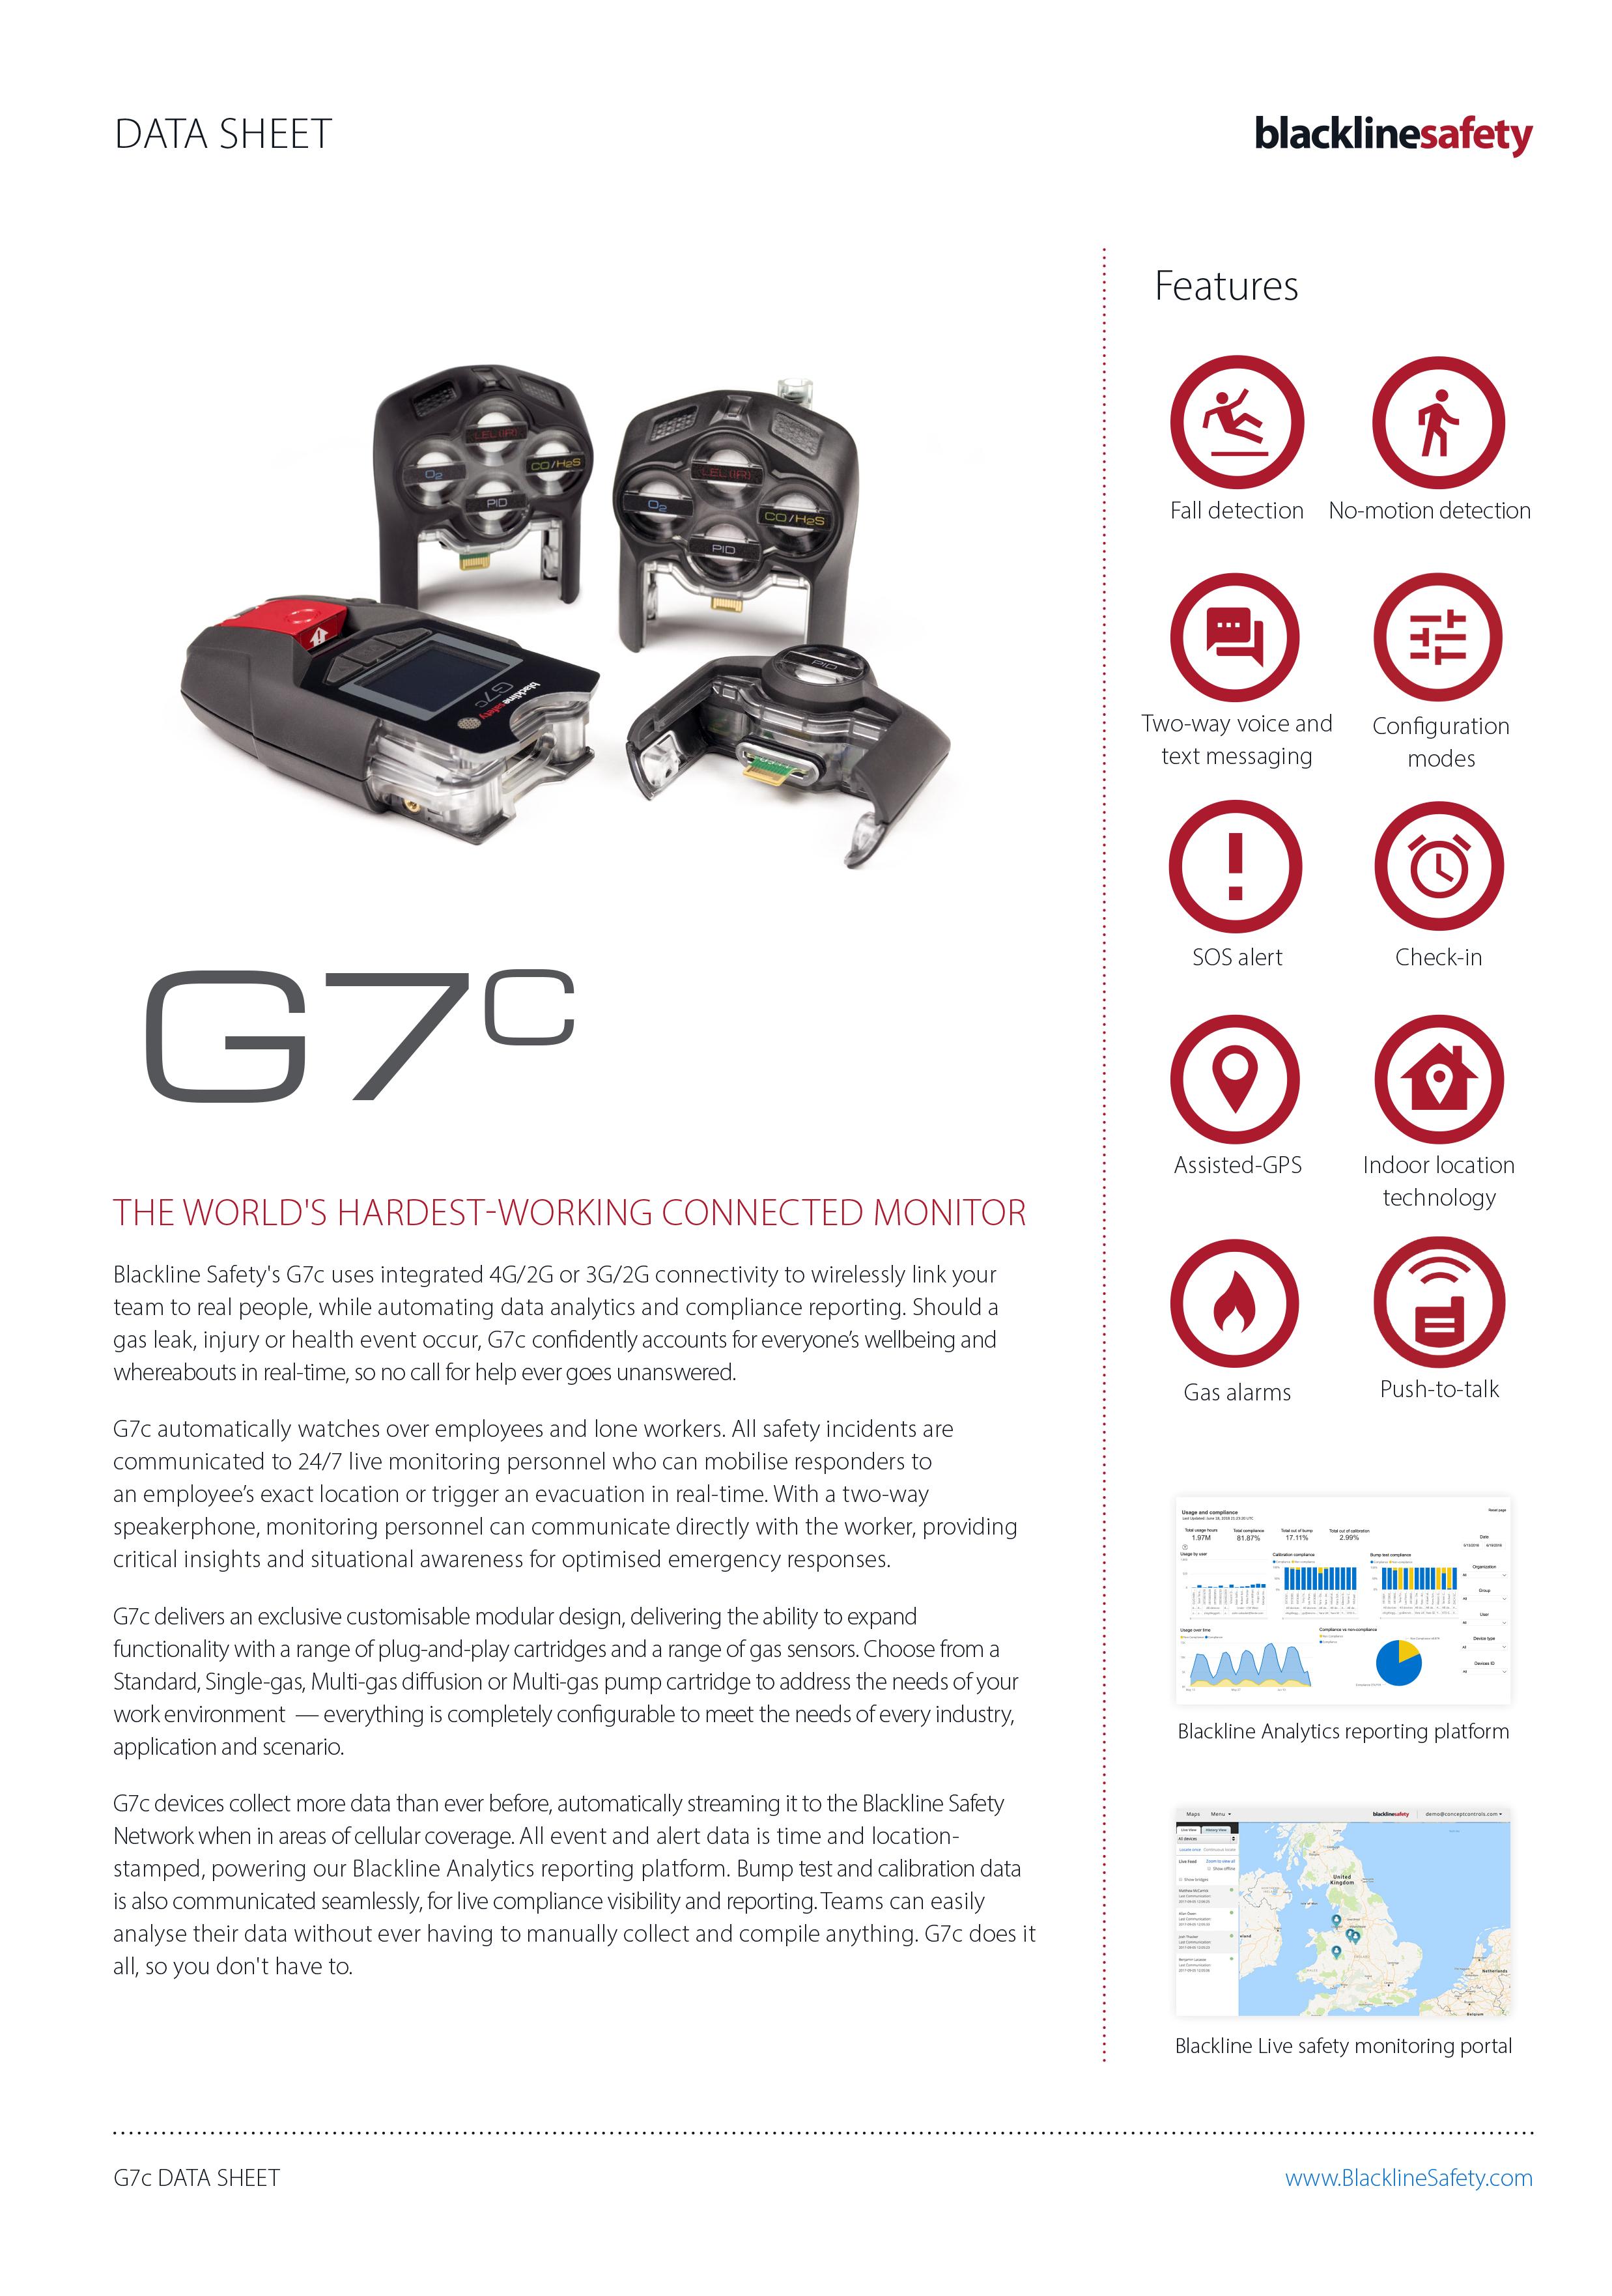 BlacklineSafety_Datasheet_G7c_EU_EN_thumbnail